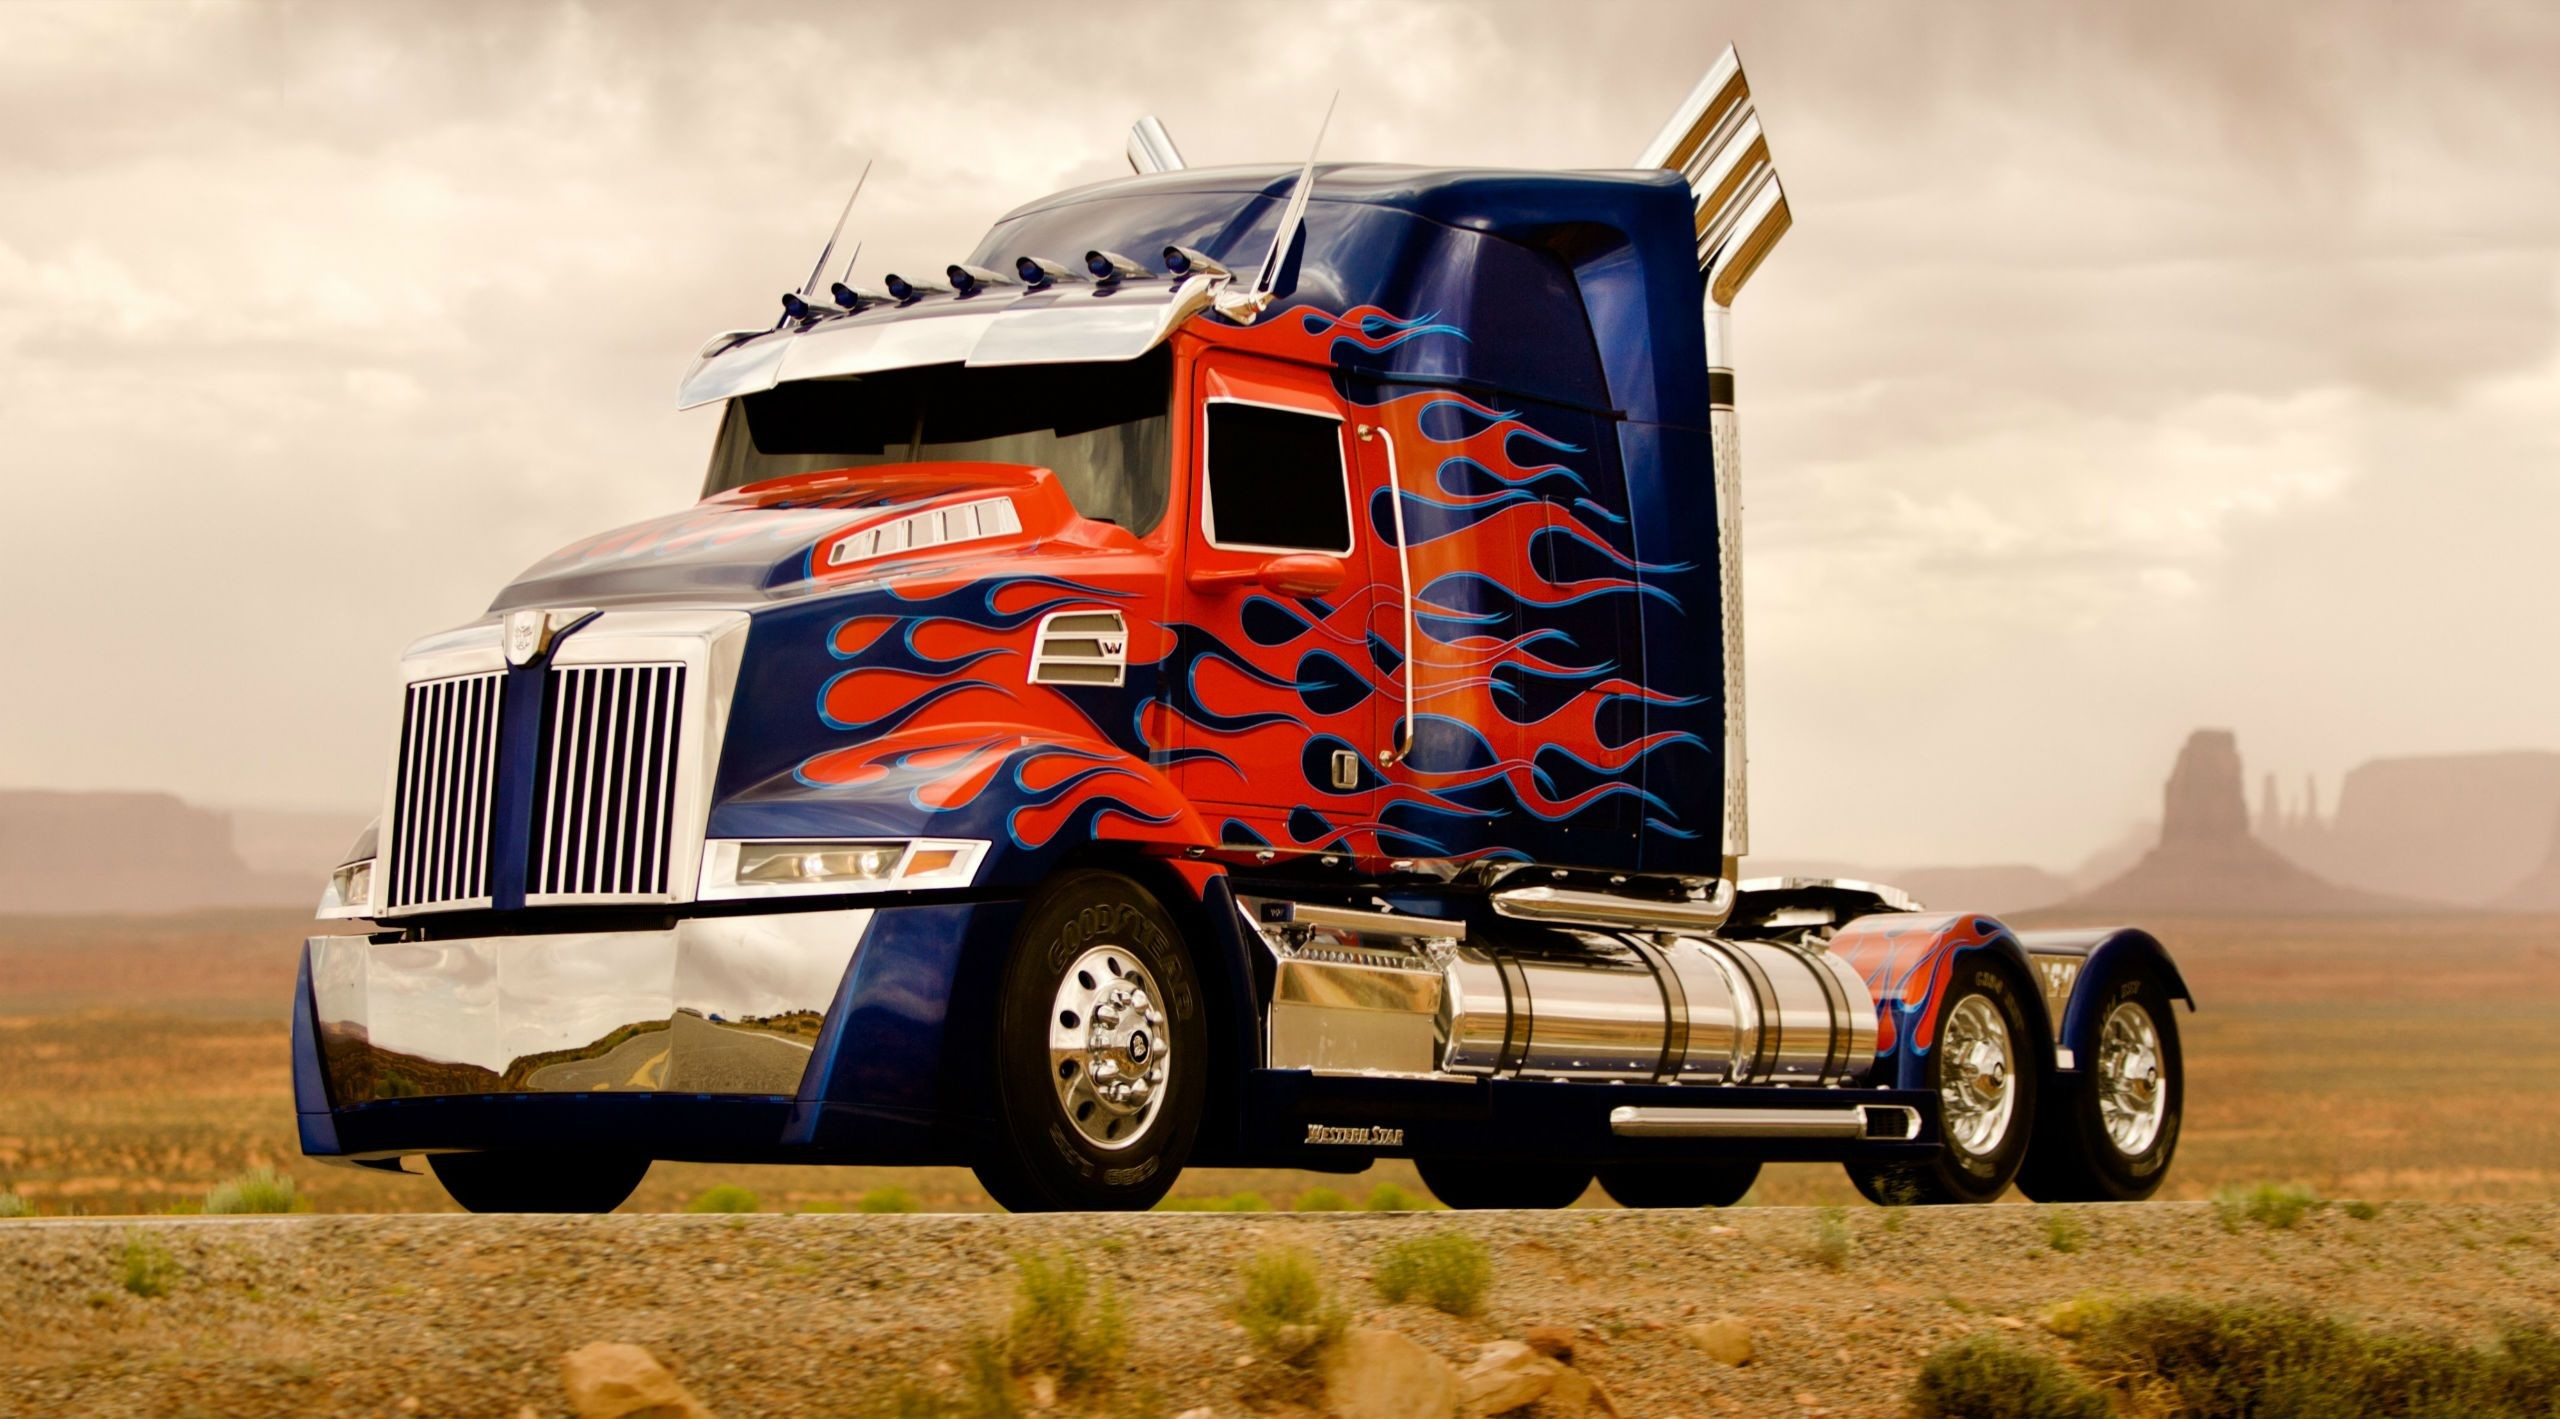 wallpaper.wiki-Semi-Truck-Wallpapers-HD-PIC-WPE001159